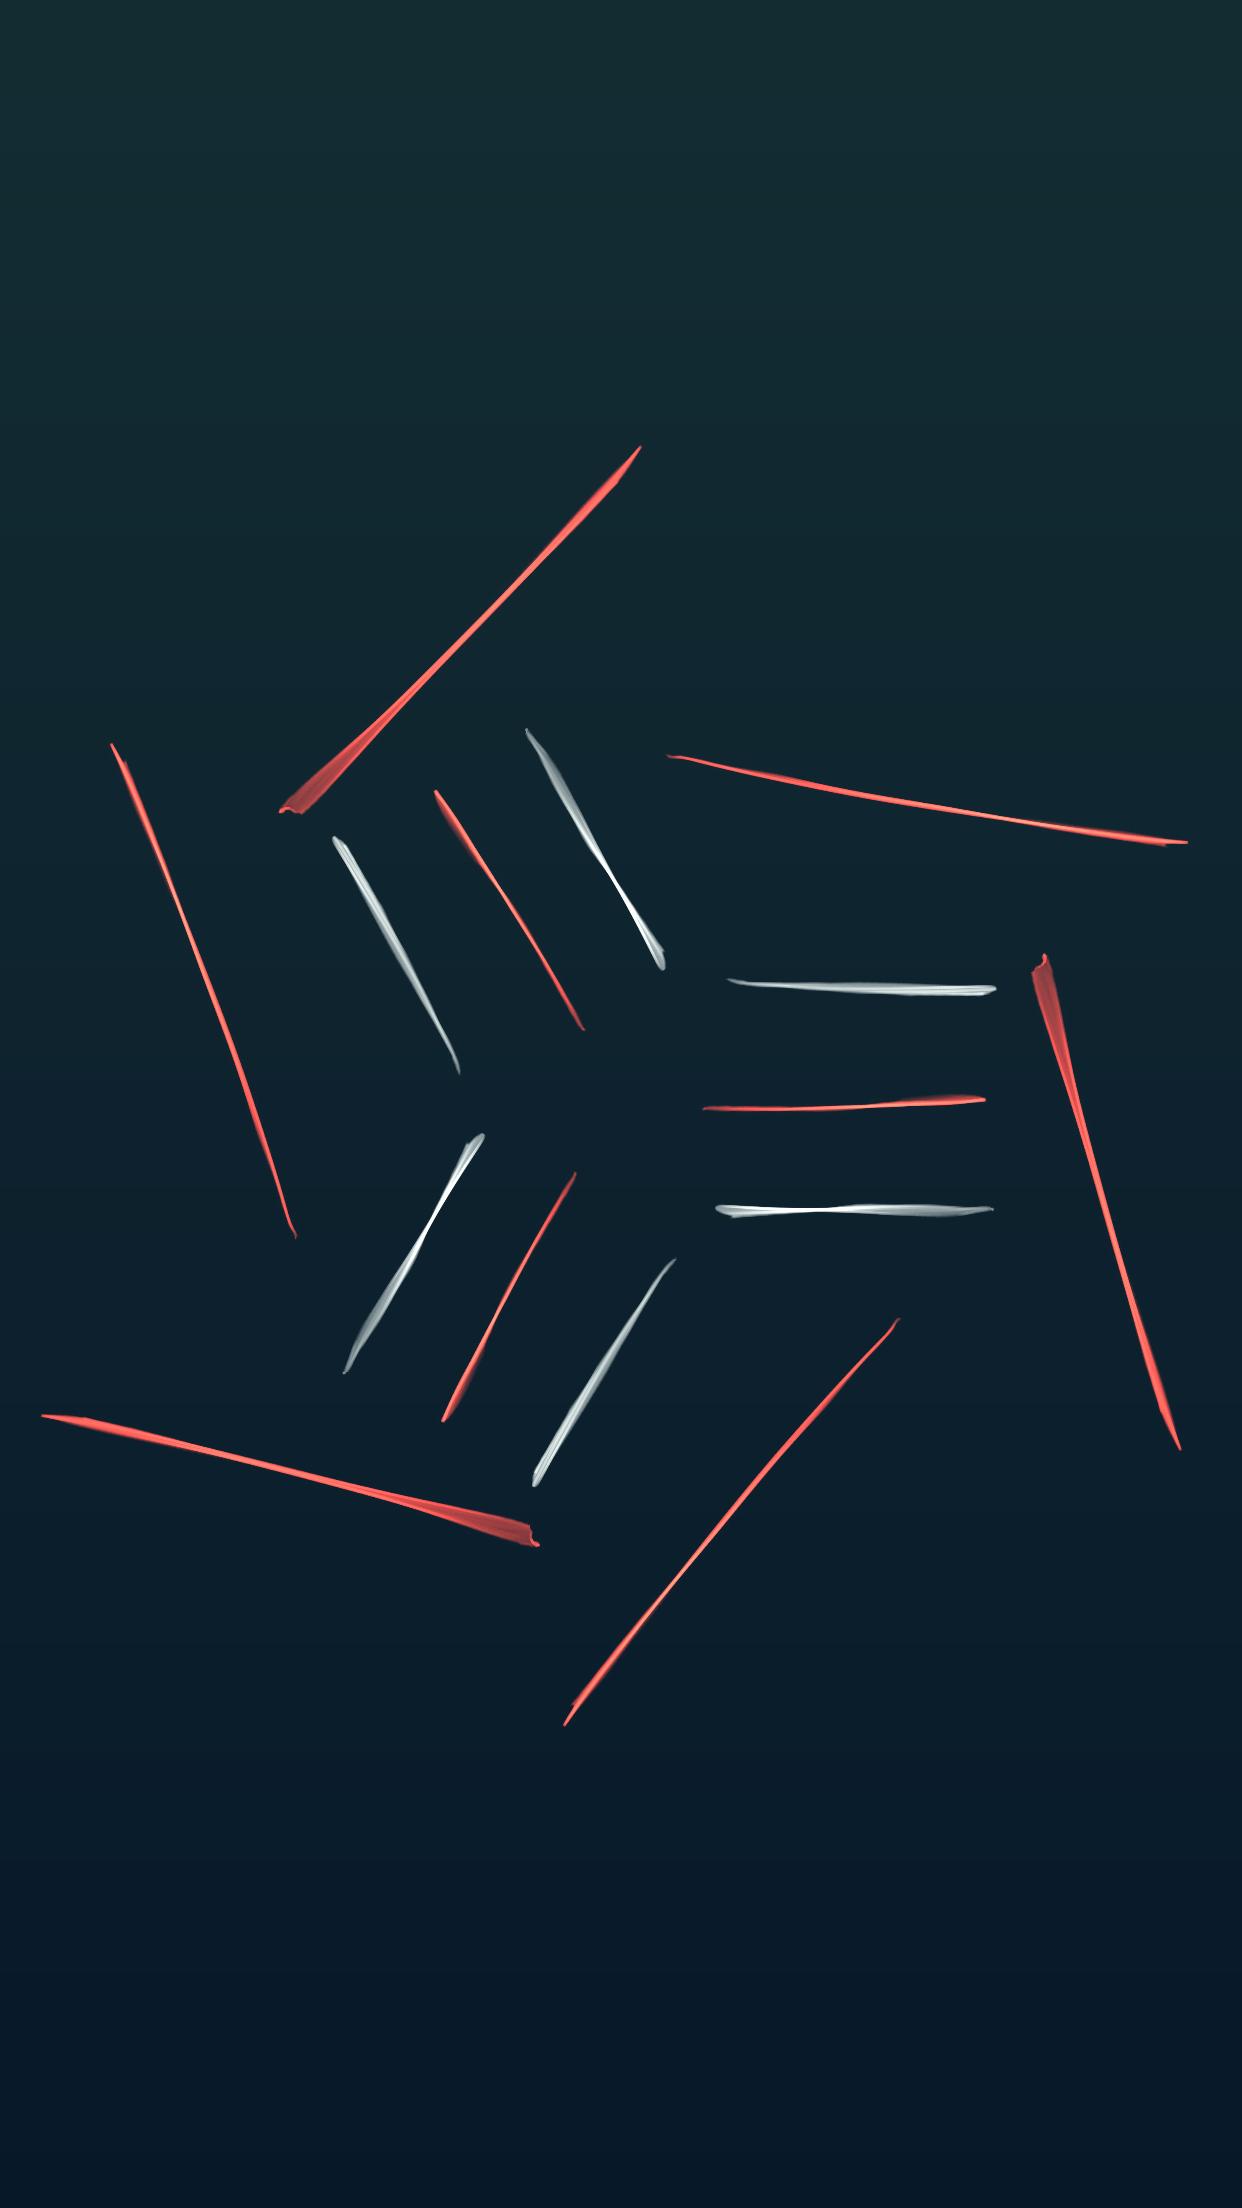 Simple Geometric Wallpapers Top Free Simple Geometric